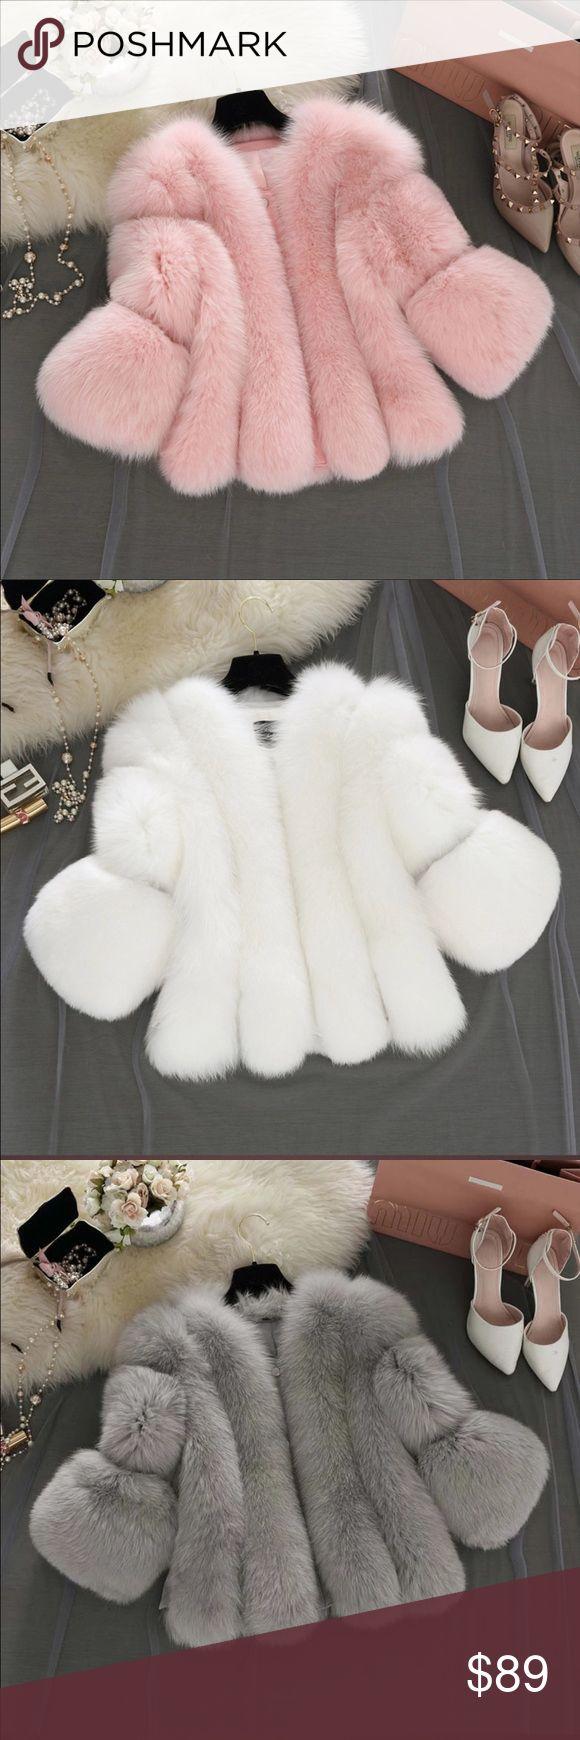 Mink fur coat 2016 Autumn Winter Elegant Women Faux Fox Fur Coat Short Pink Fur Coat Female Faux Fur Jacket S-4XL Jackets & Coats Puffers